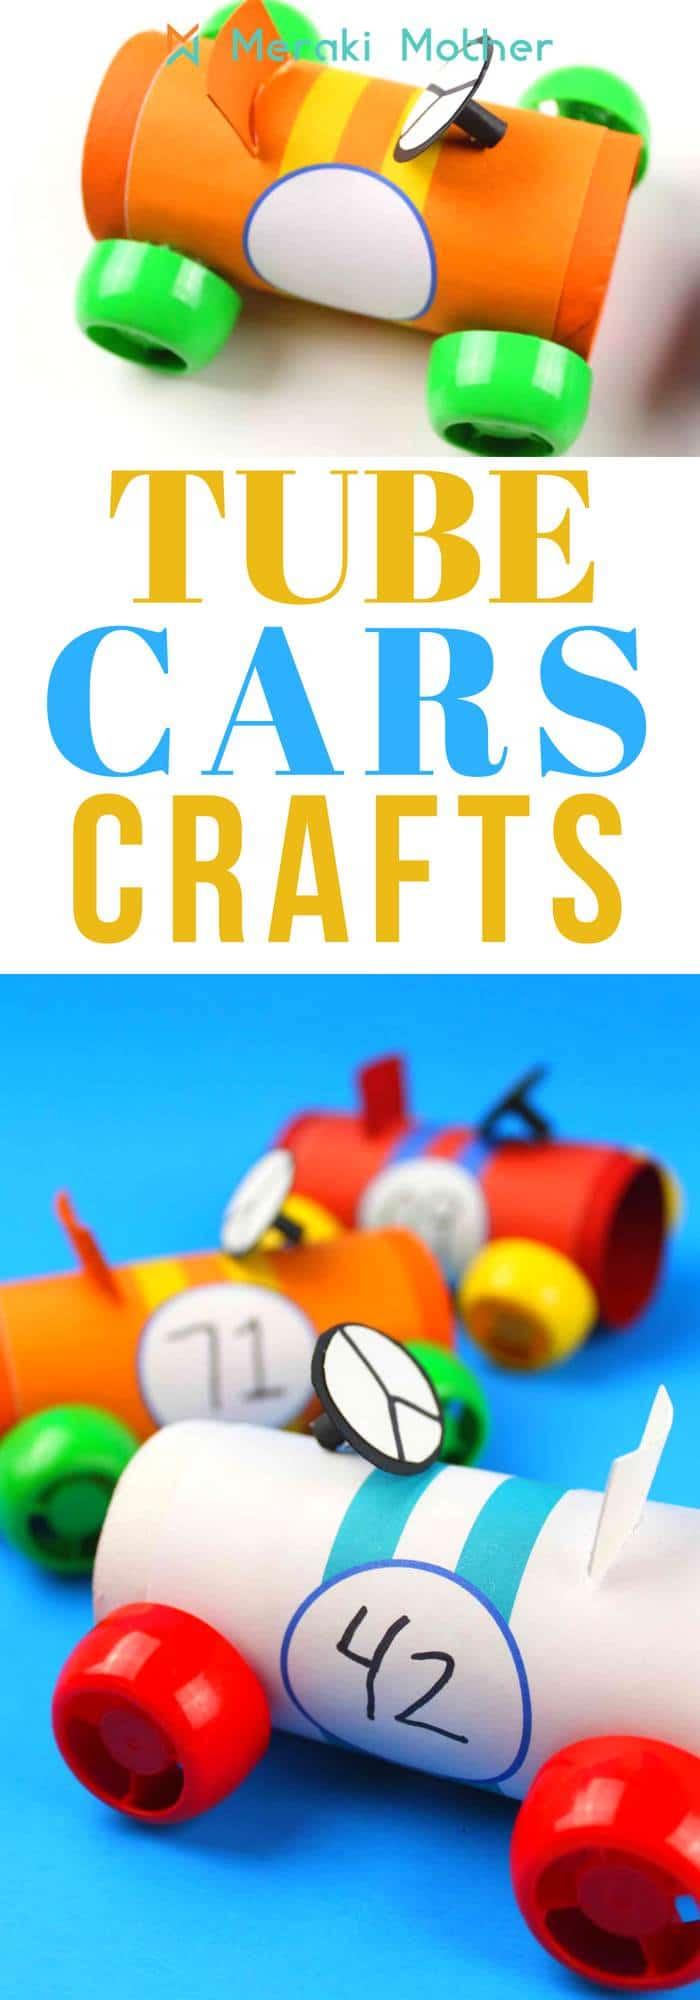 tube cars craft